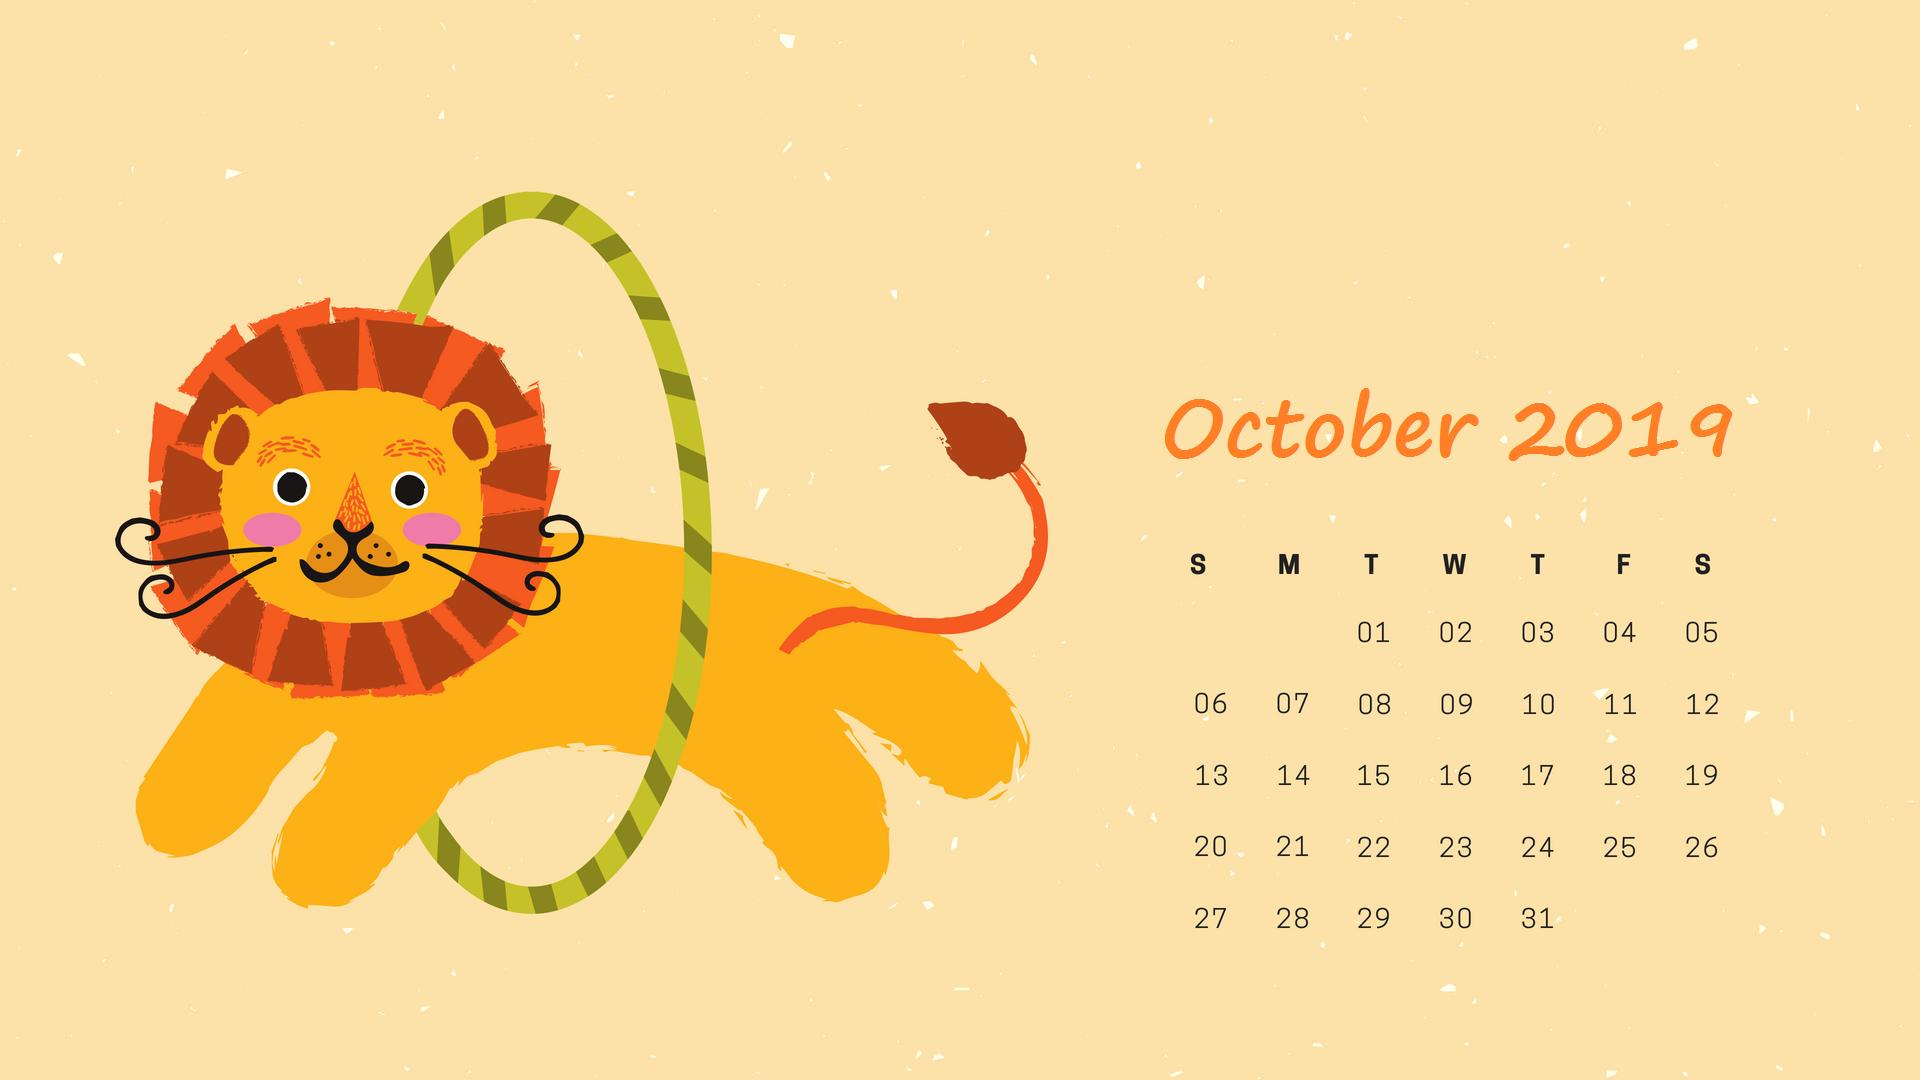 2019 October HD Calendar Wallpaper